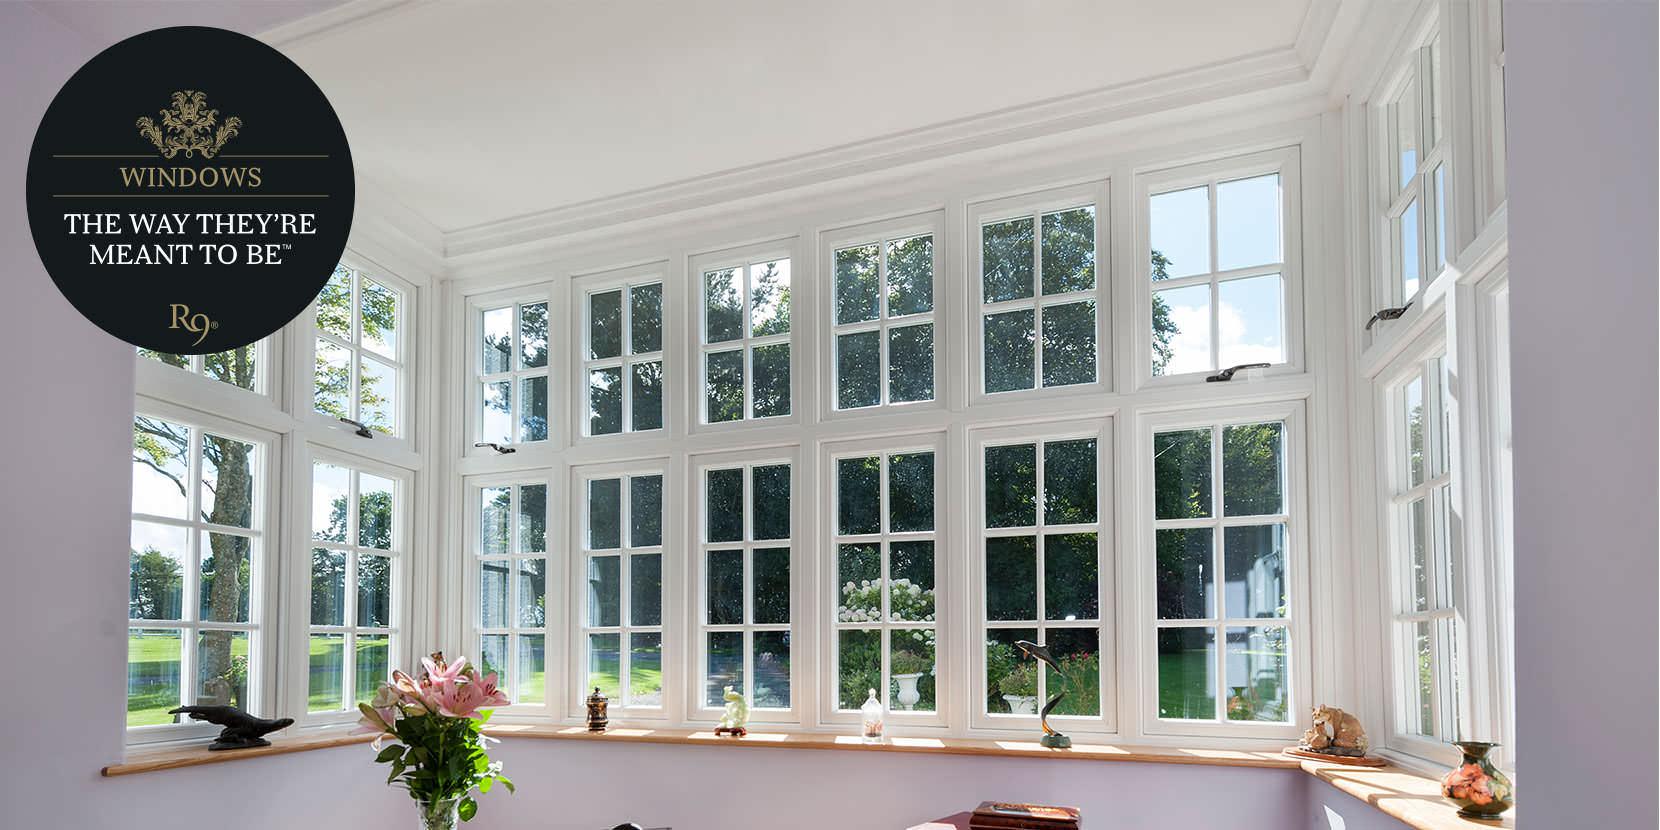 Residence 9 windows Harlow Essex